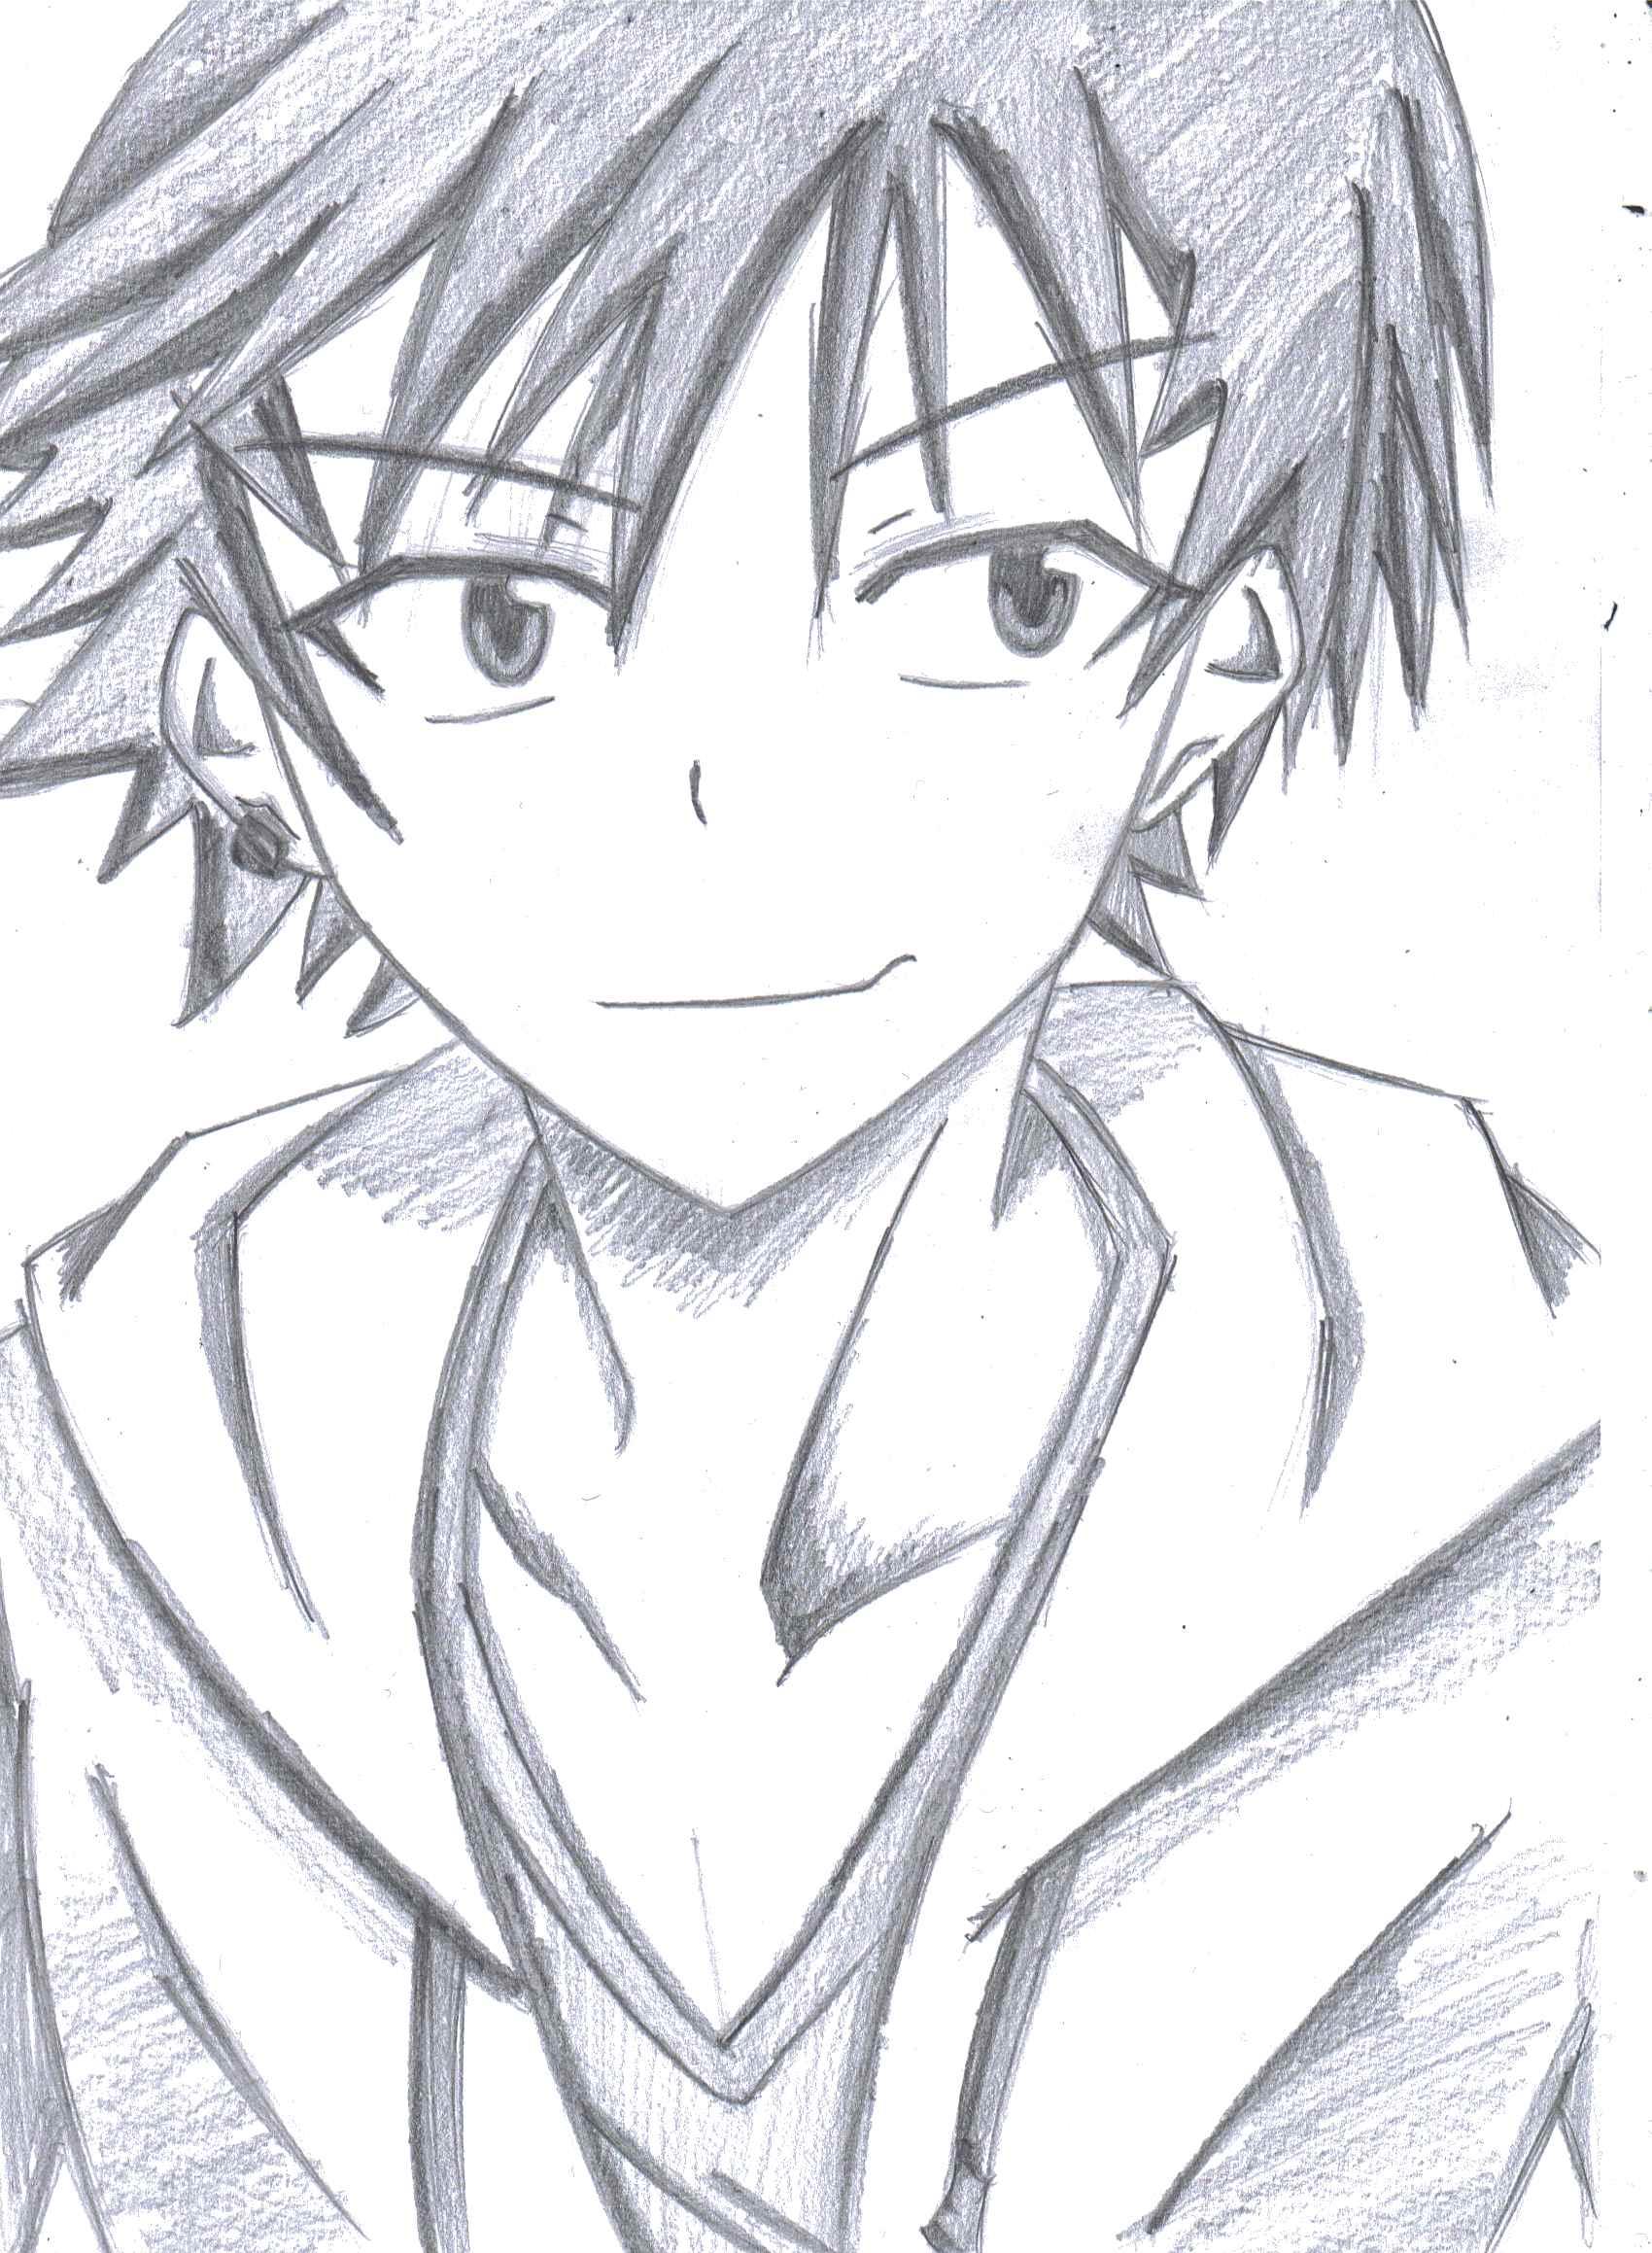 Manga Practice Drawing by KgElitez on DeviantArt